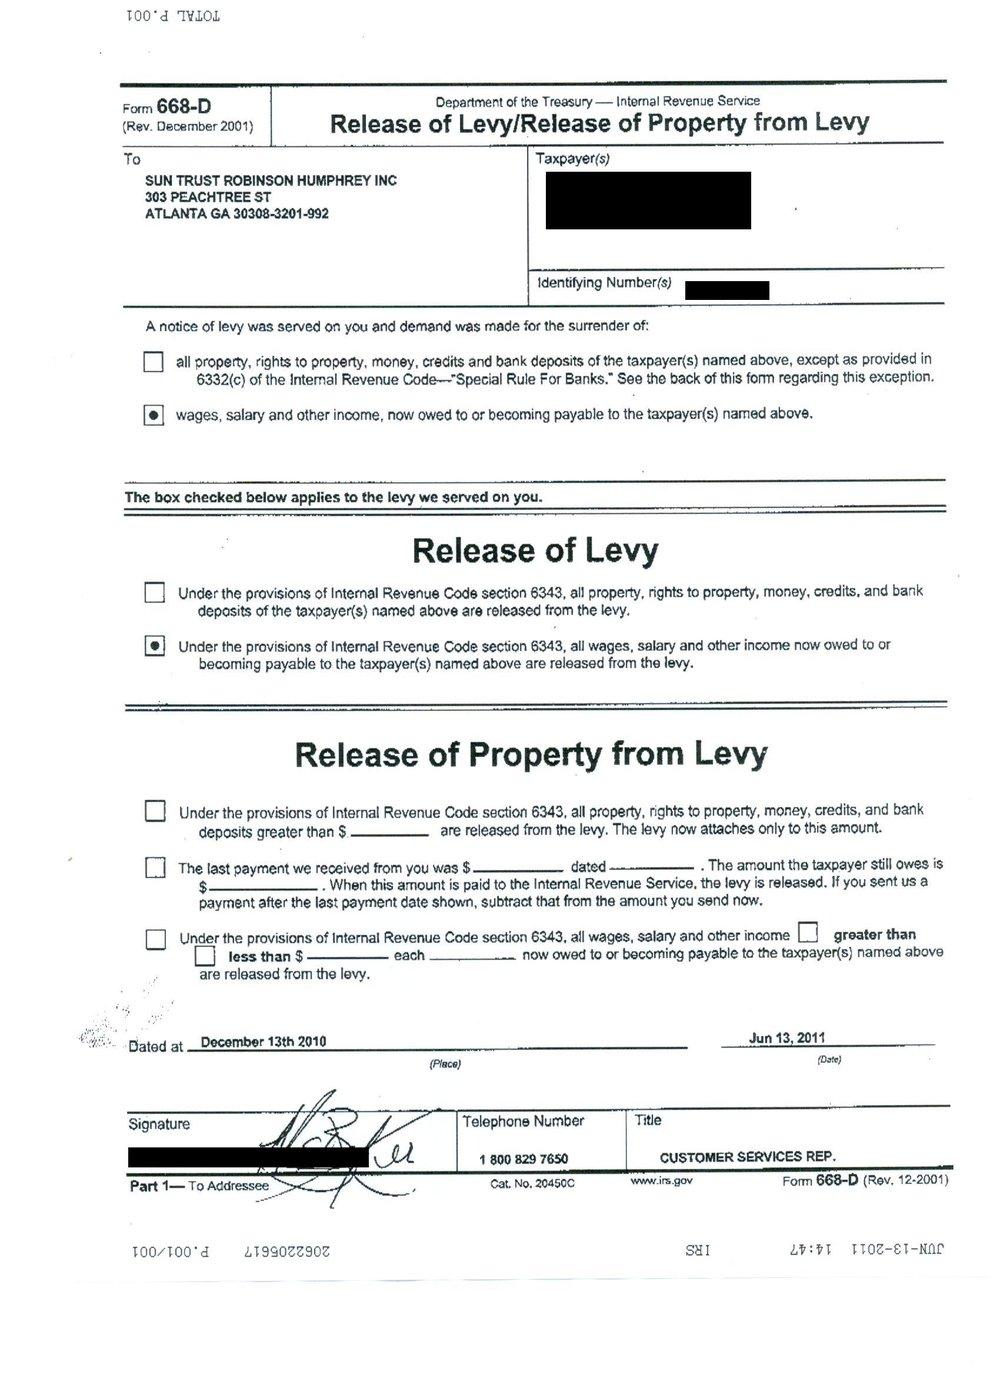 Release of Levy Orlando.jpg